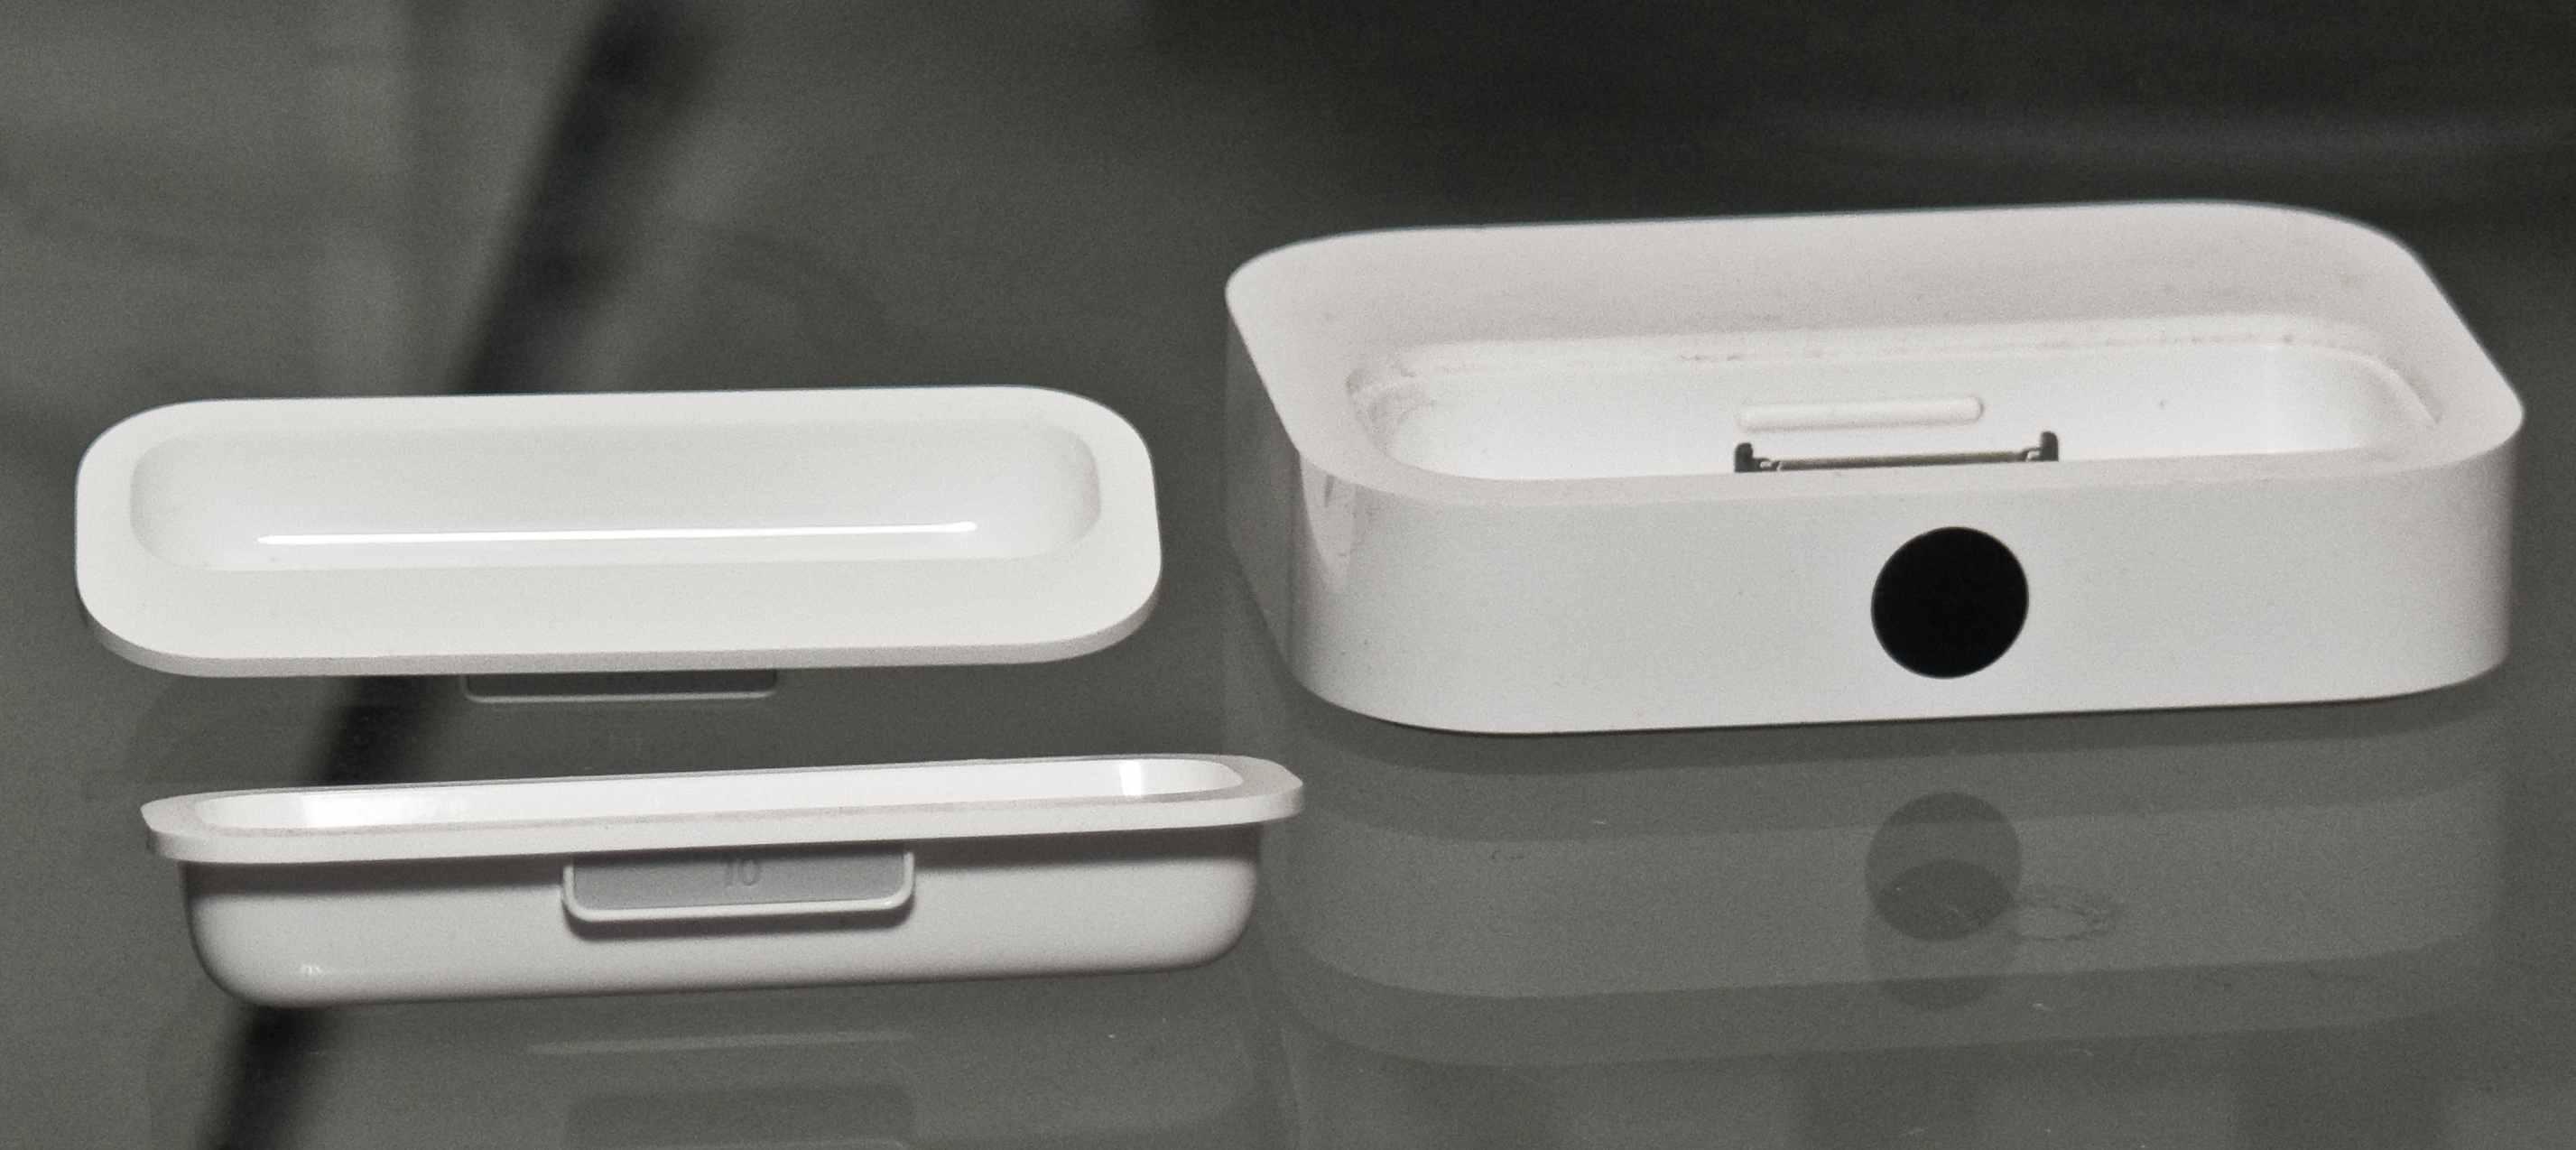 Iphone  Dock And Speaker